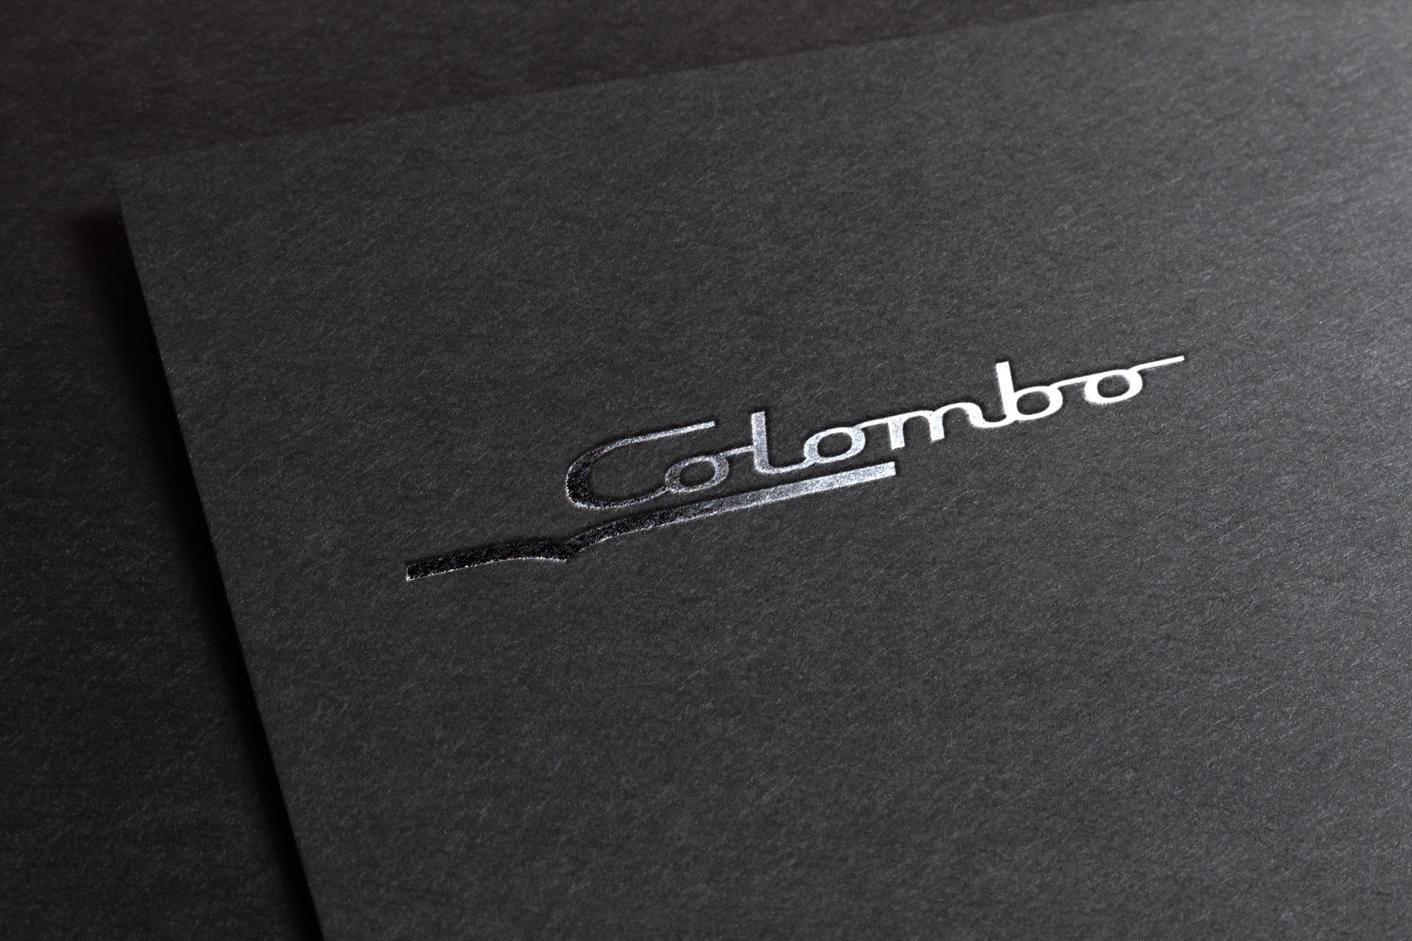 Colombo Yacht marchio